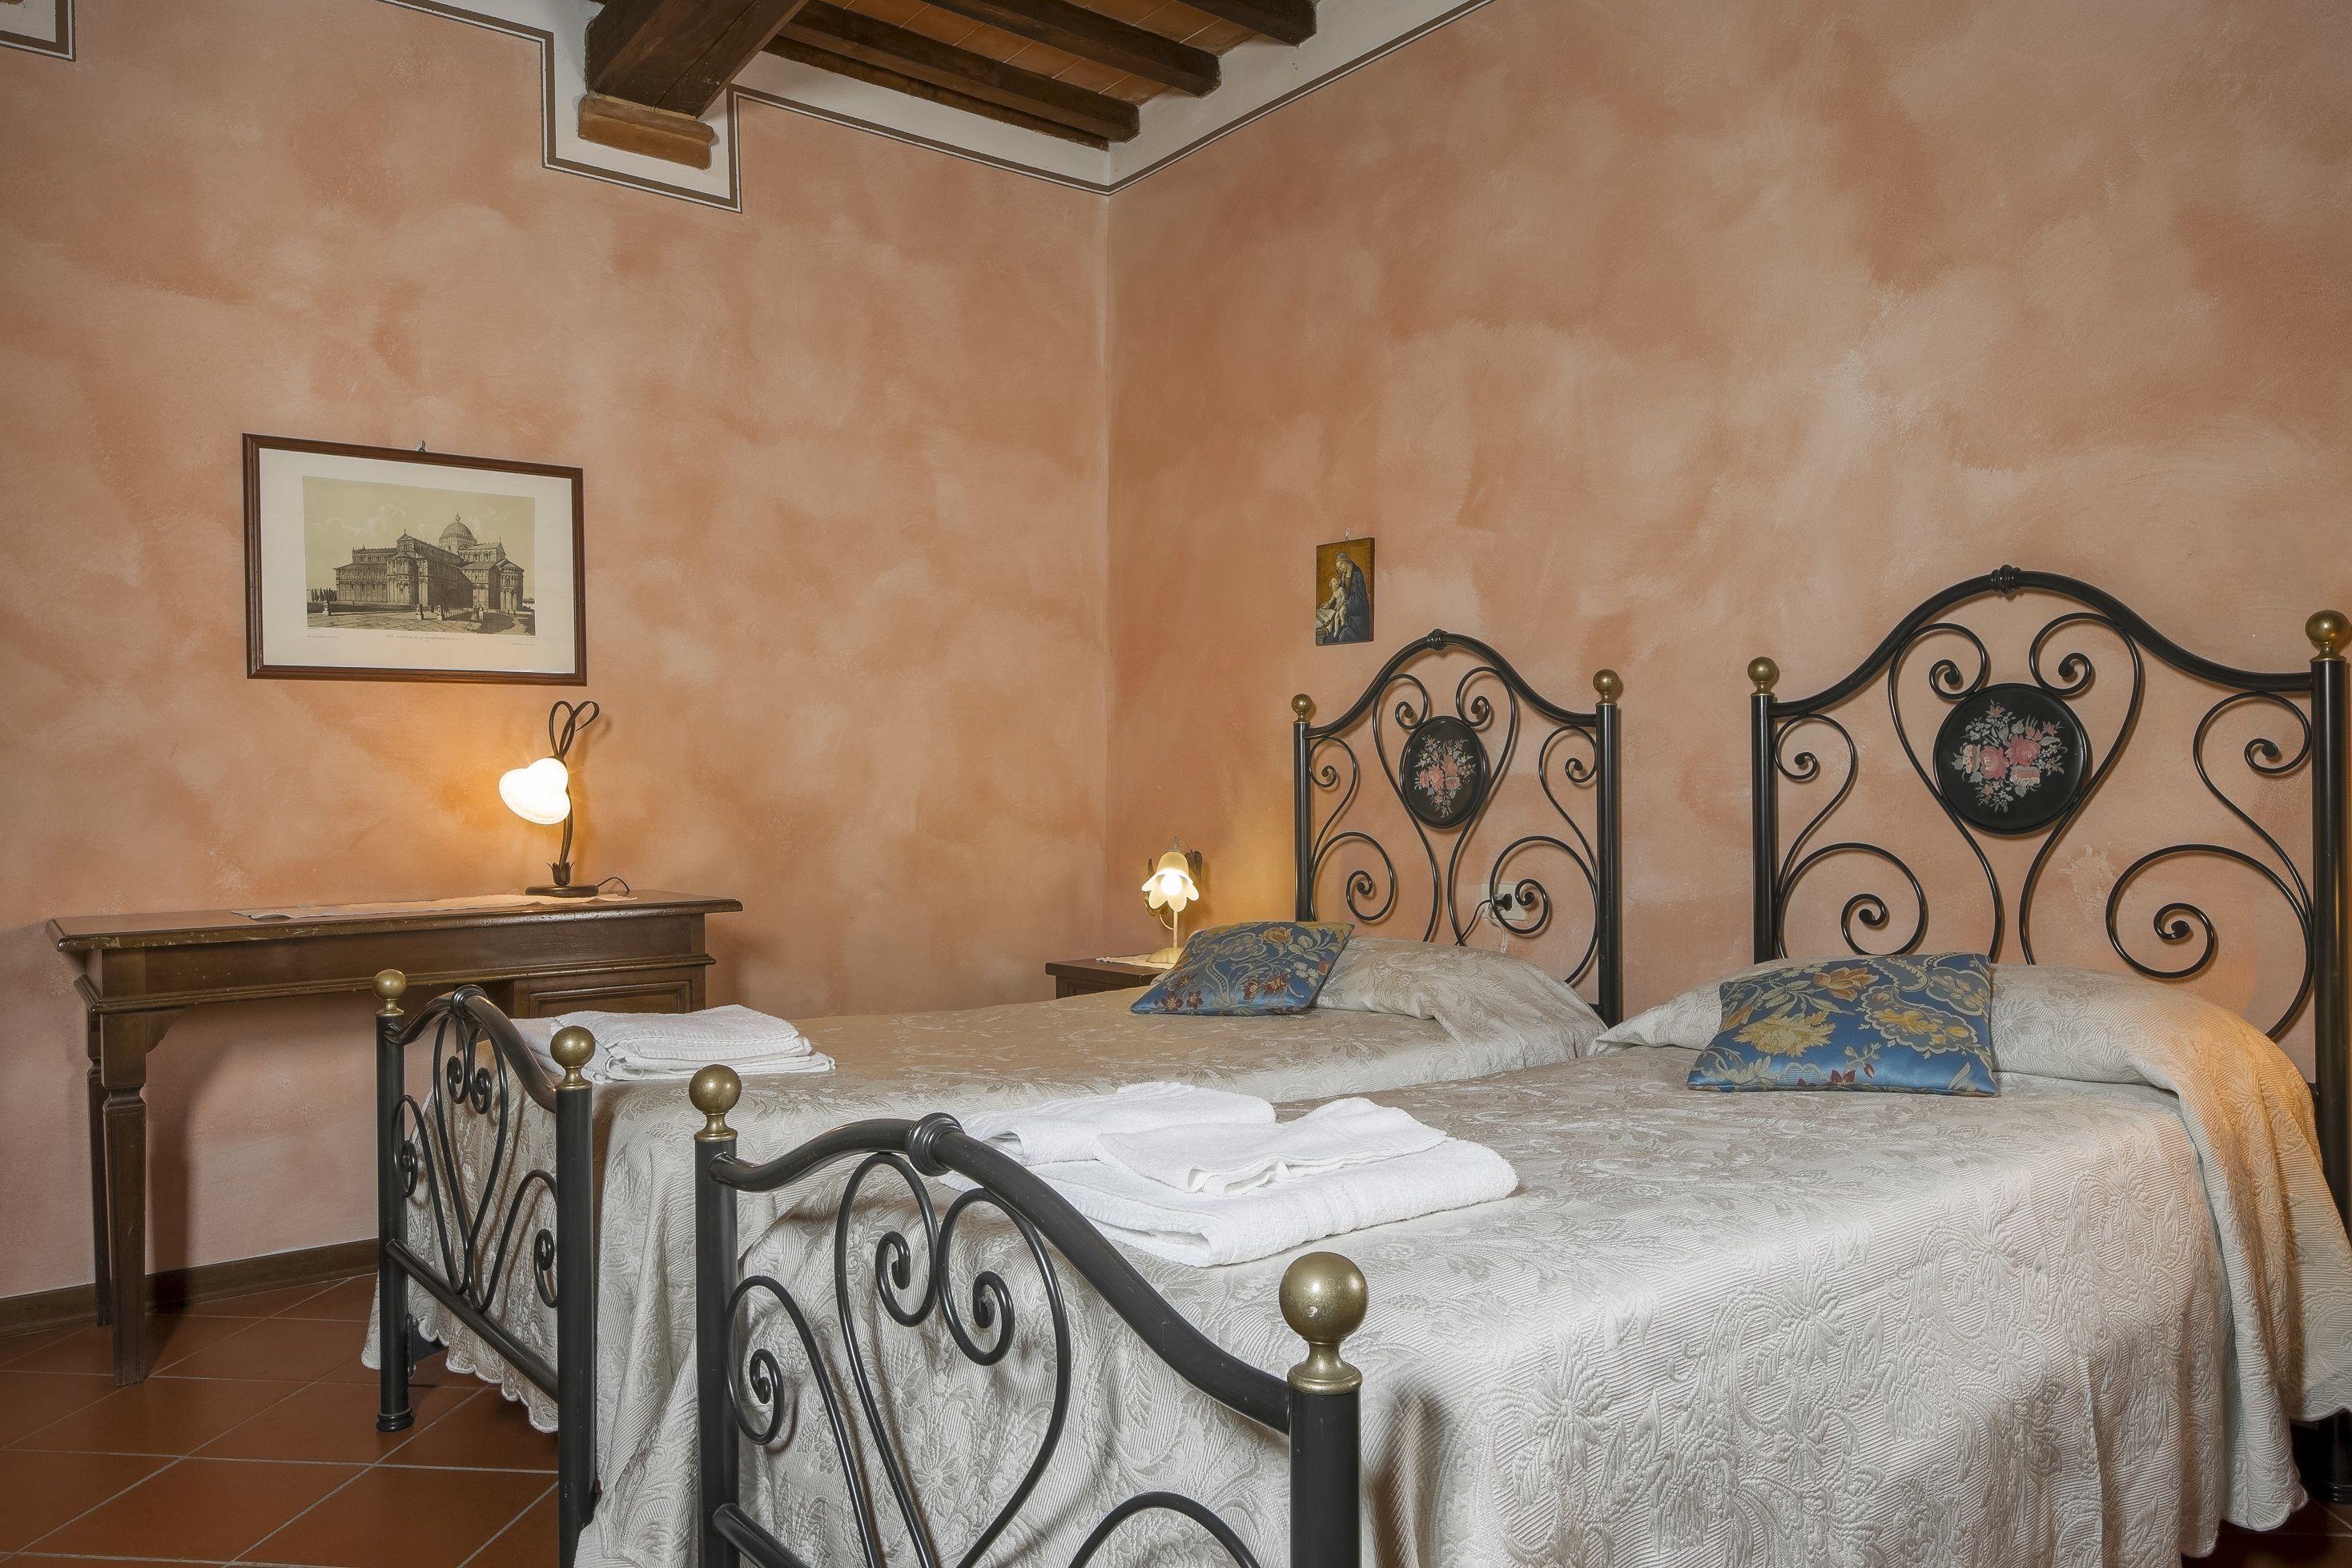 Apartment Agriturismo Il Sapito - Cherubini Holiday Home photo 16550541